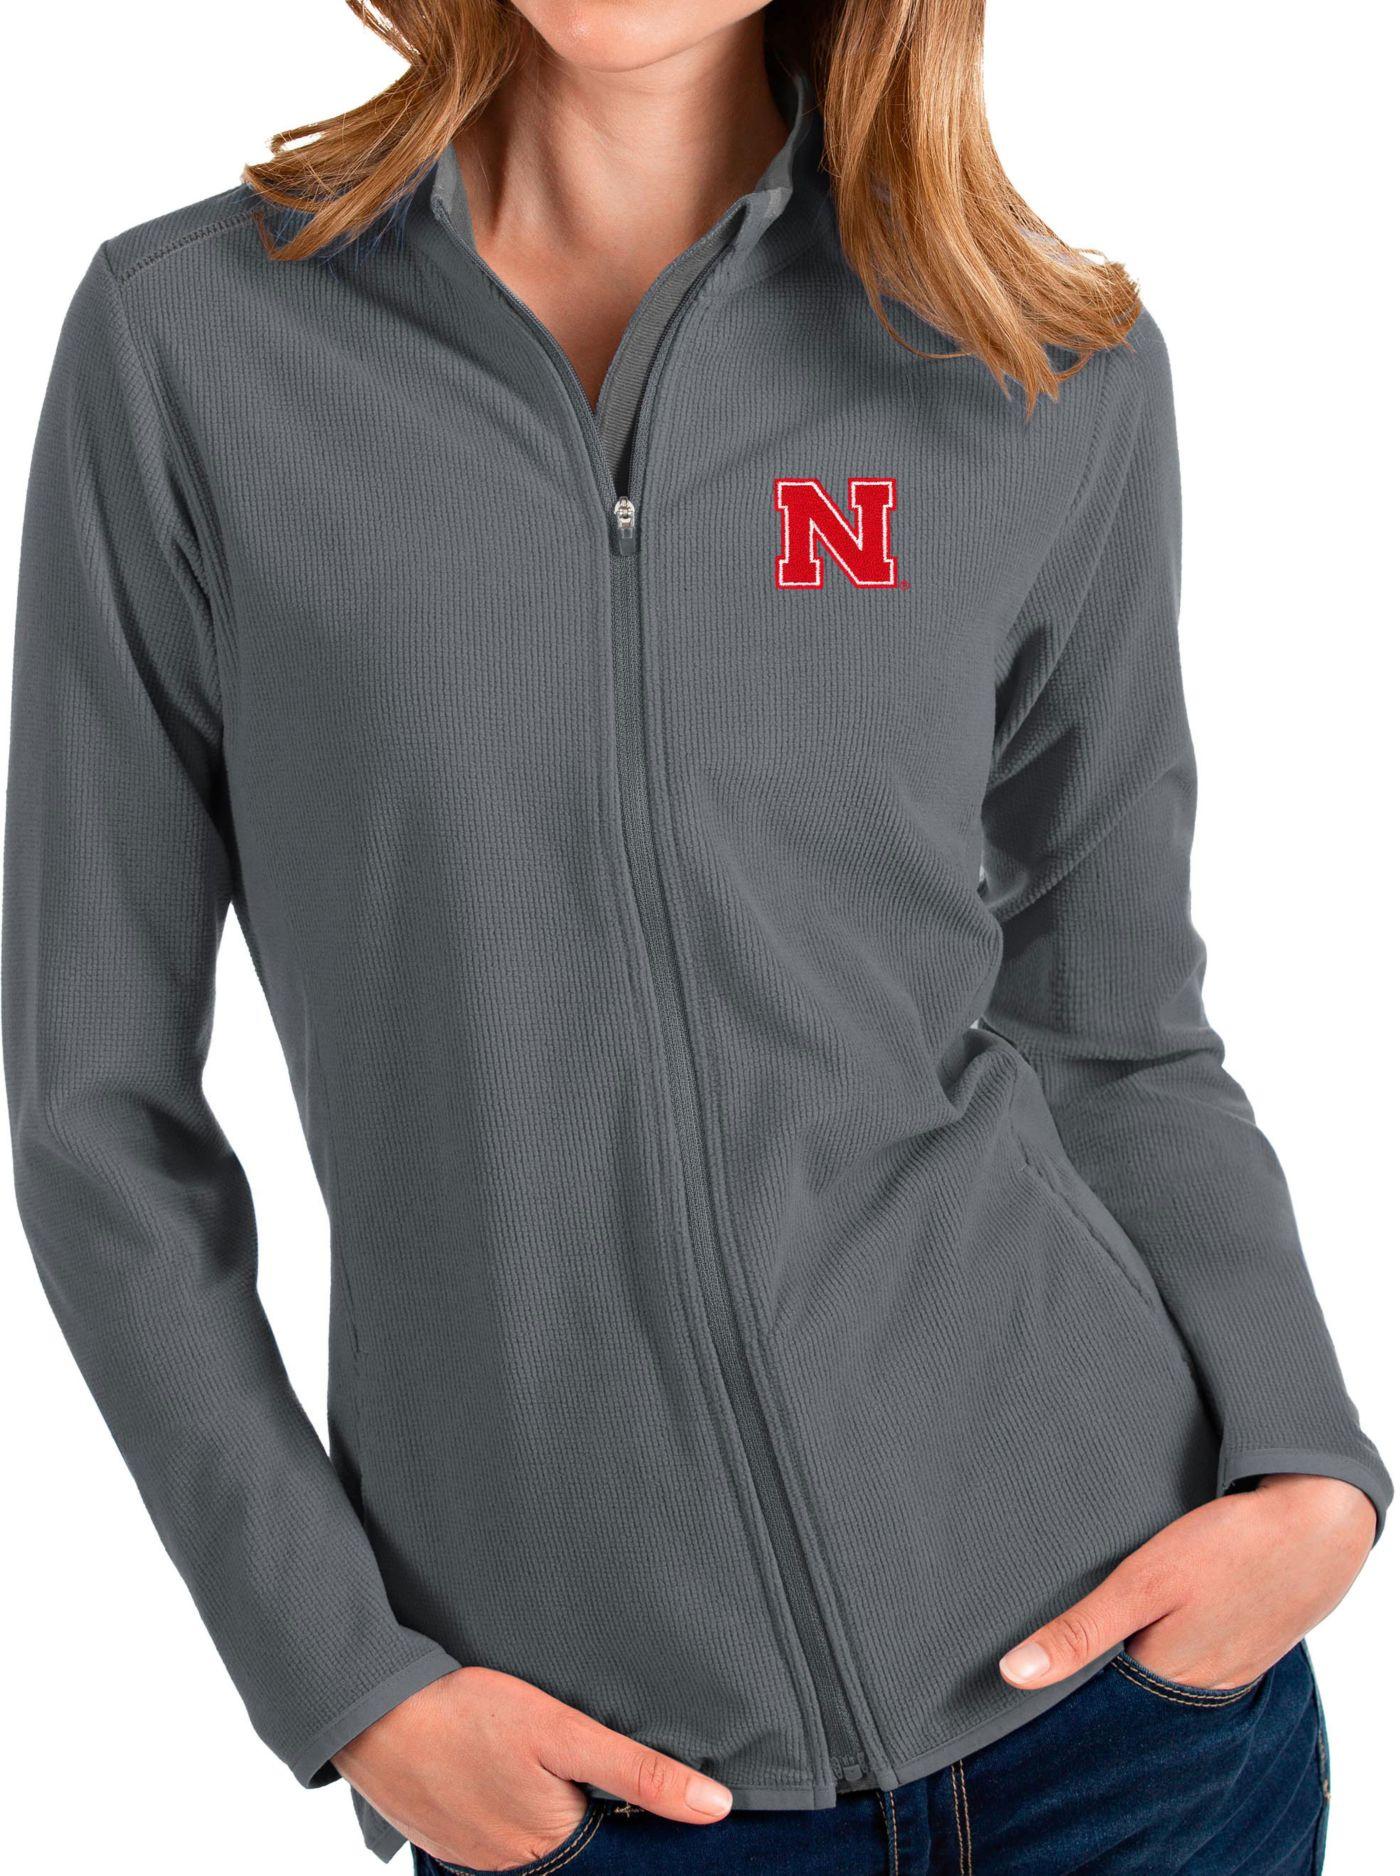 Antigua Women's Nebraska Cornhuskers Grey Glacier Full-Zip Jacket